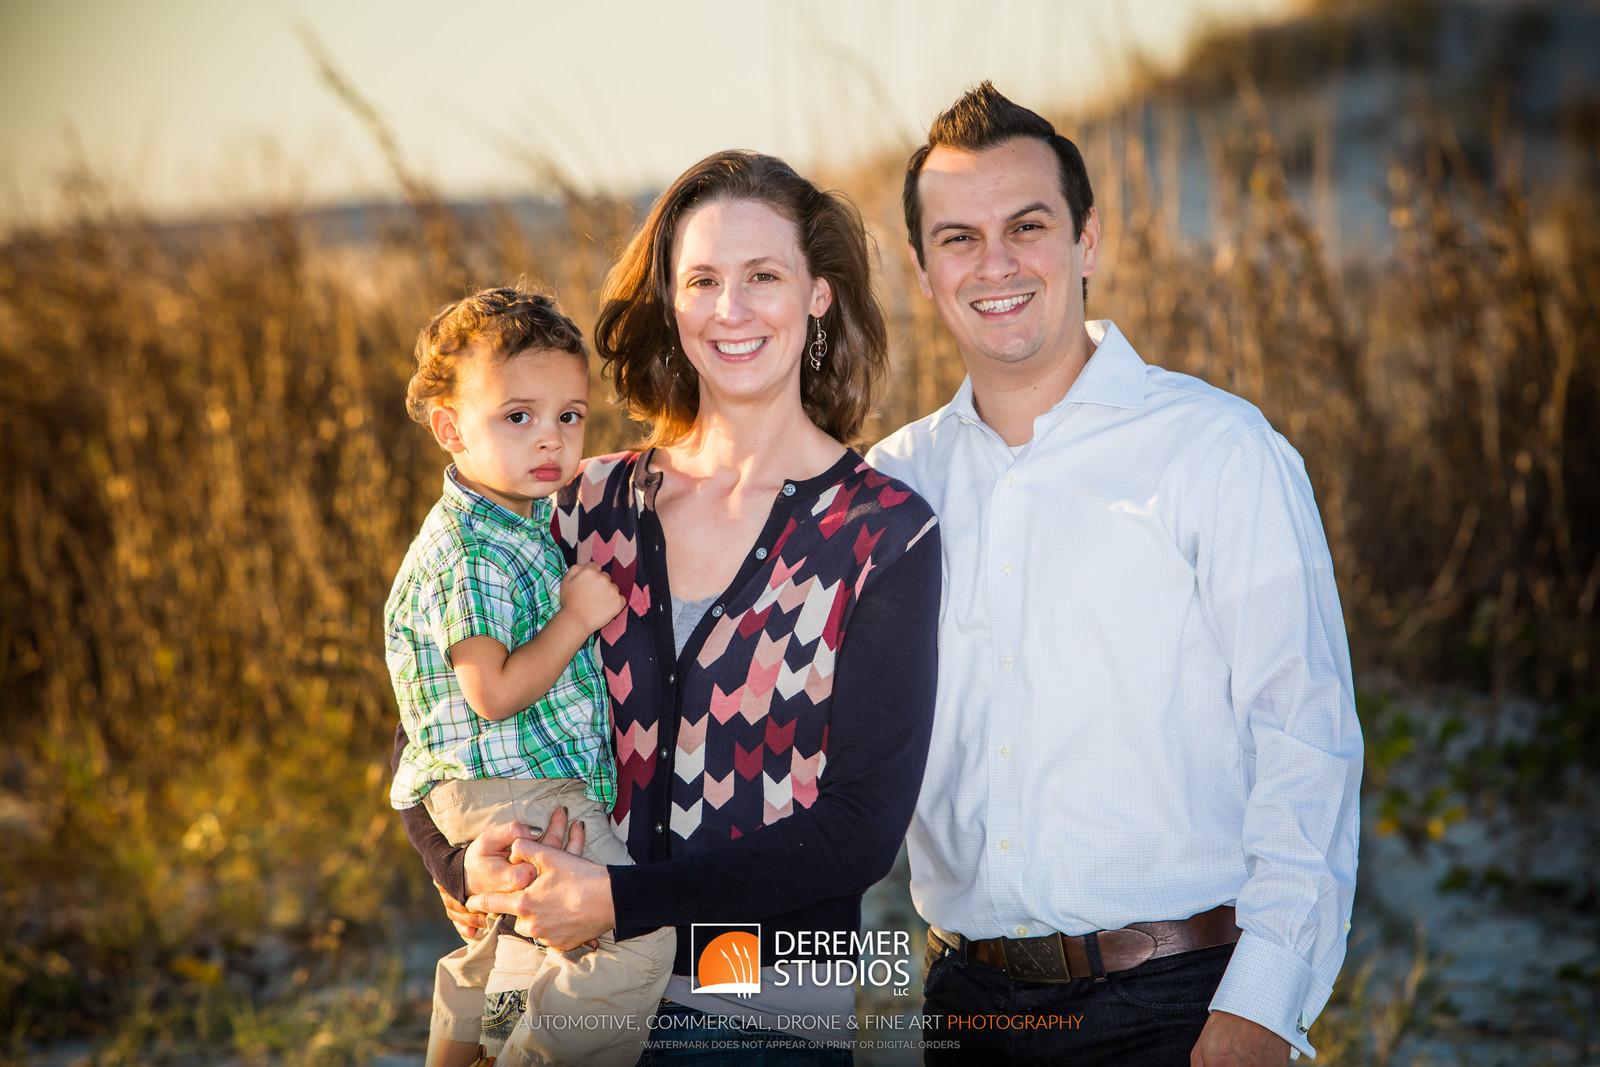 Deremer Family Portraits